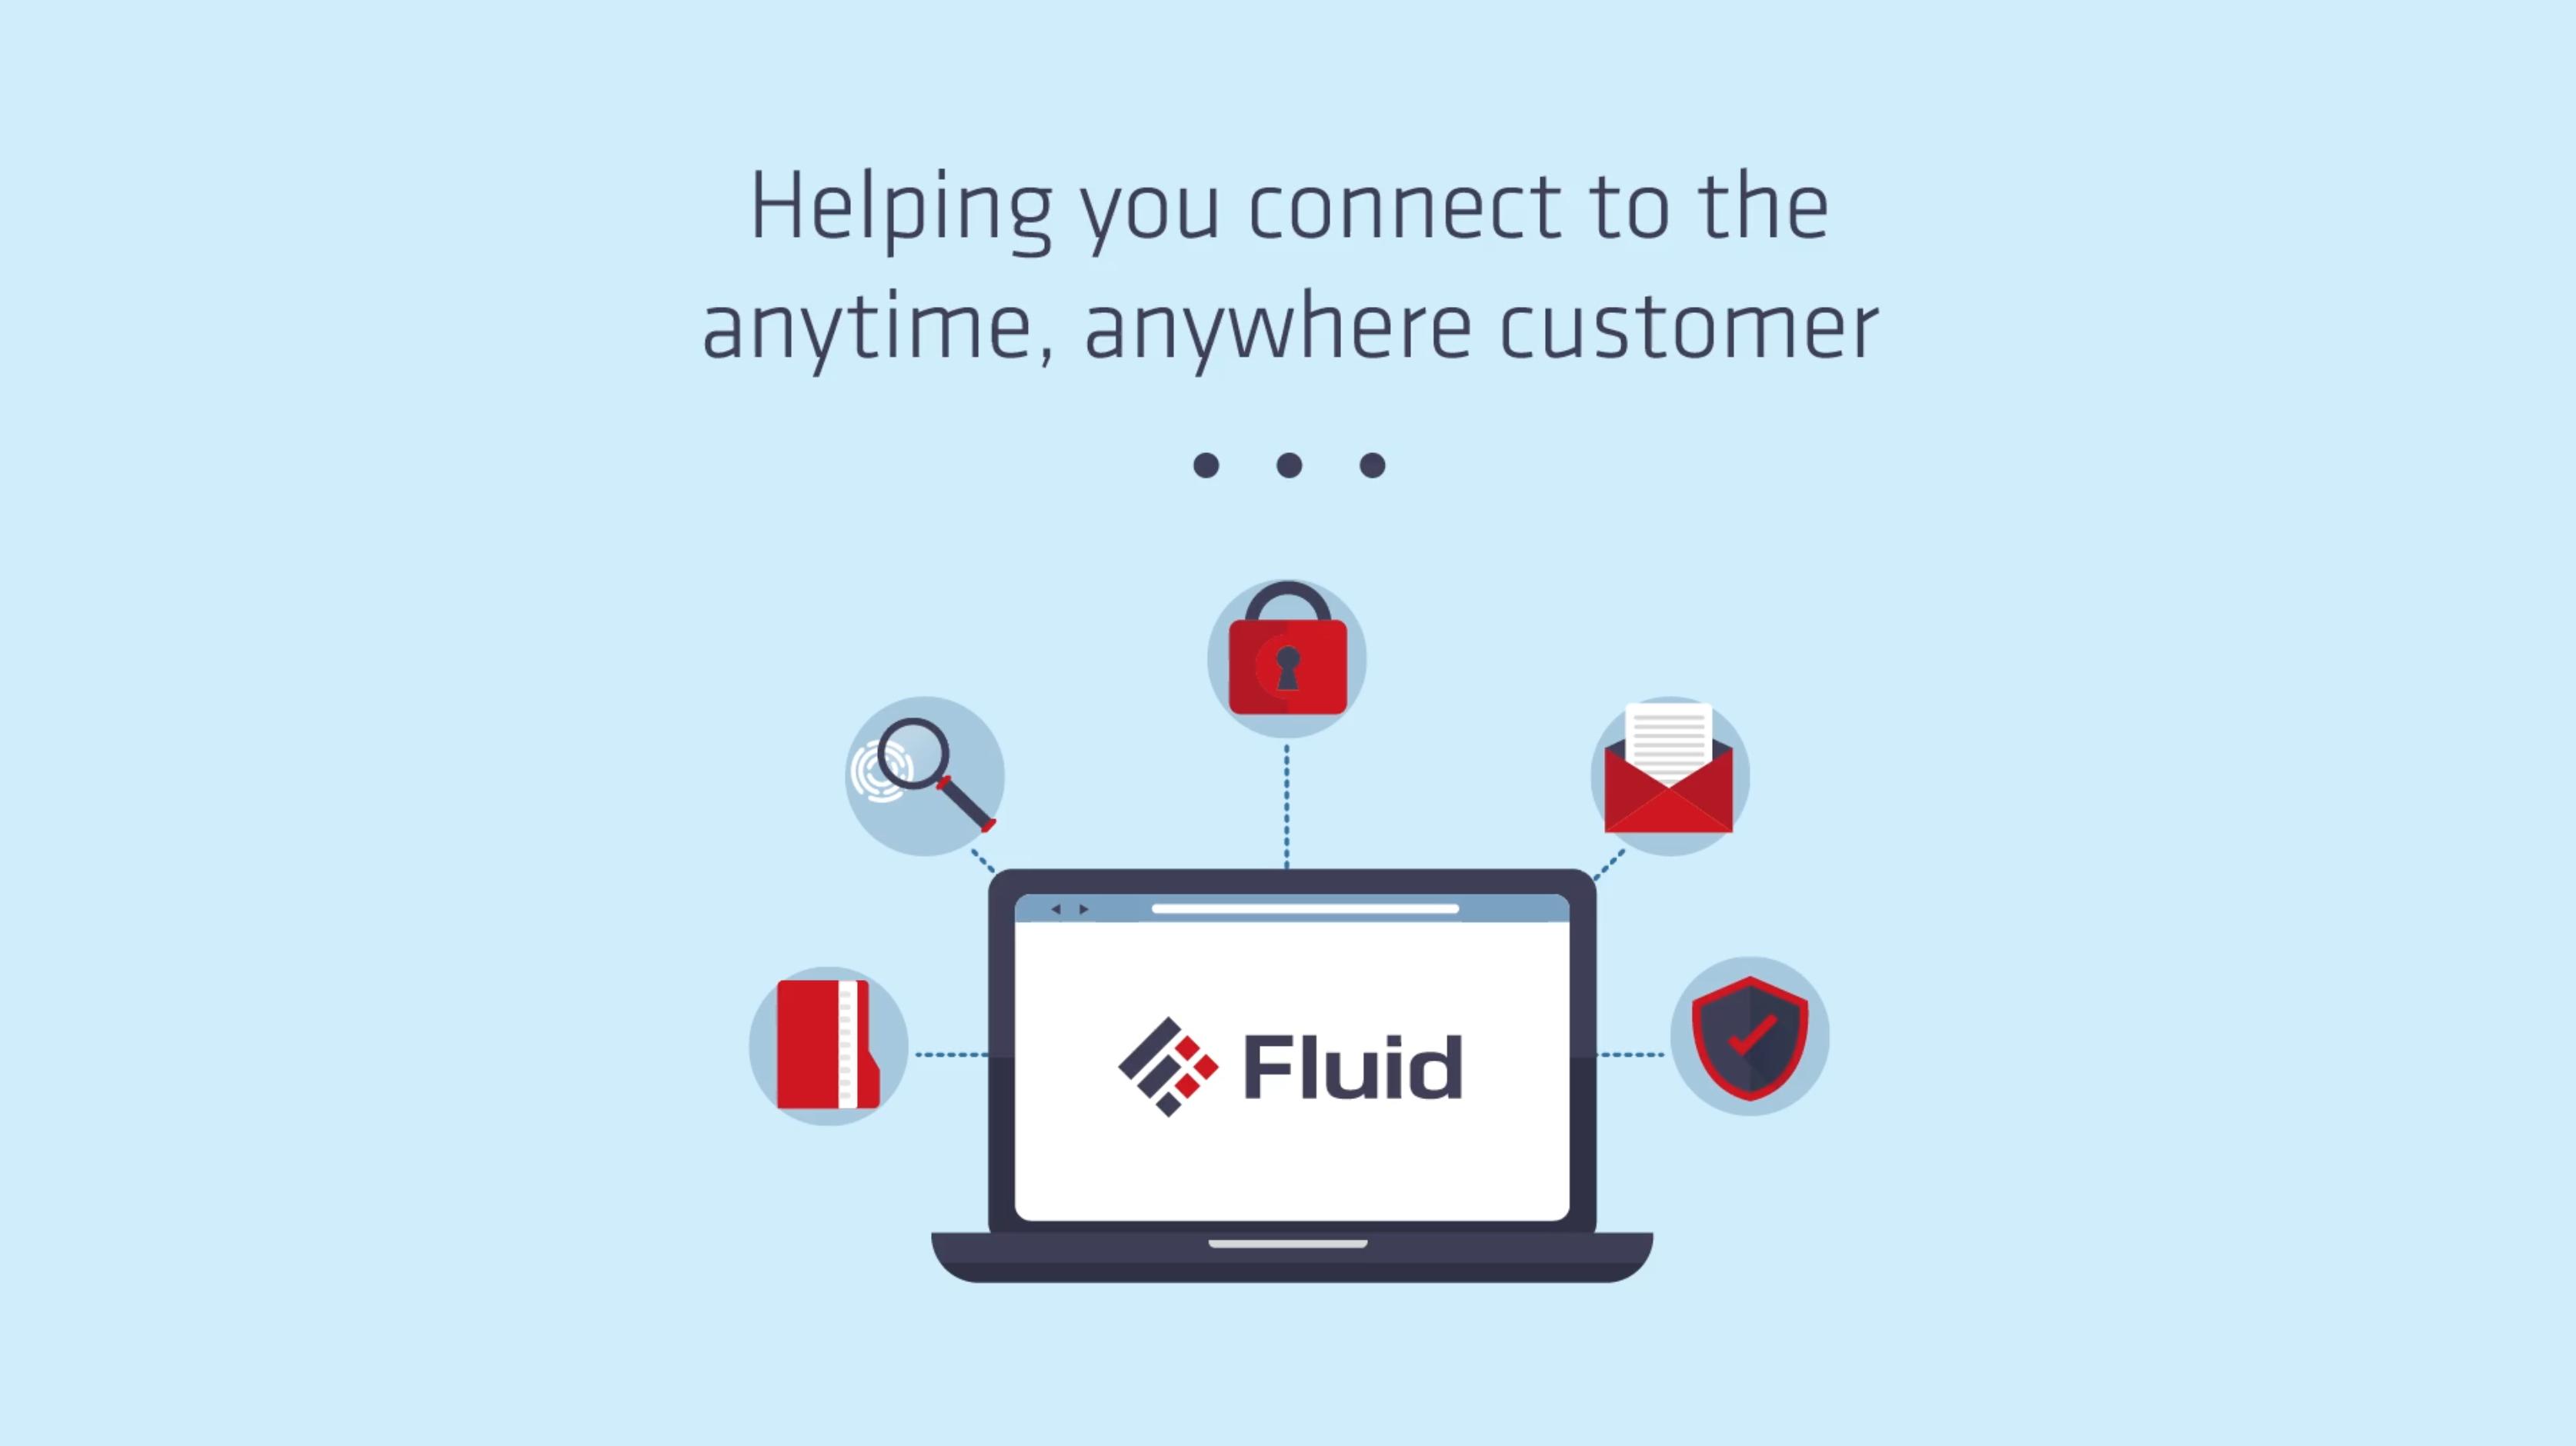 Fluid computer icon